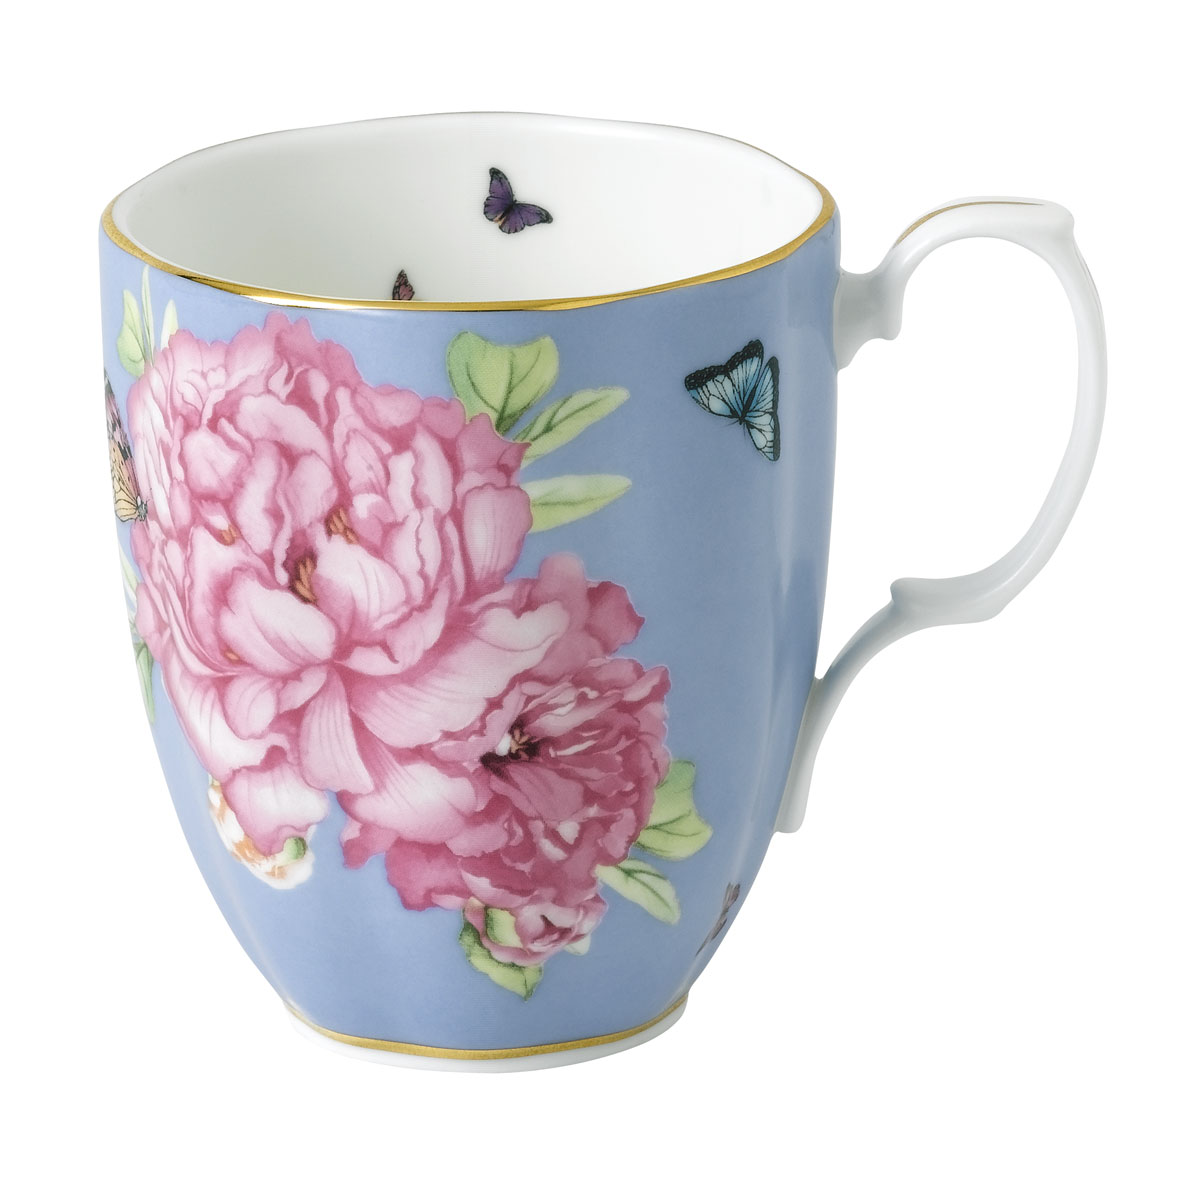 Royal Albert Miranda Kerr Friendship Mug Tranquility Blue